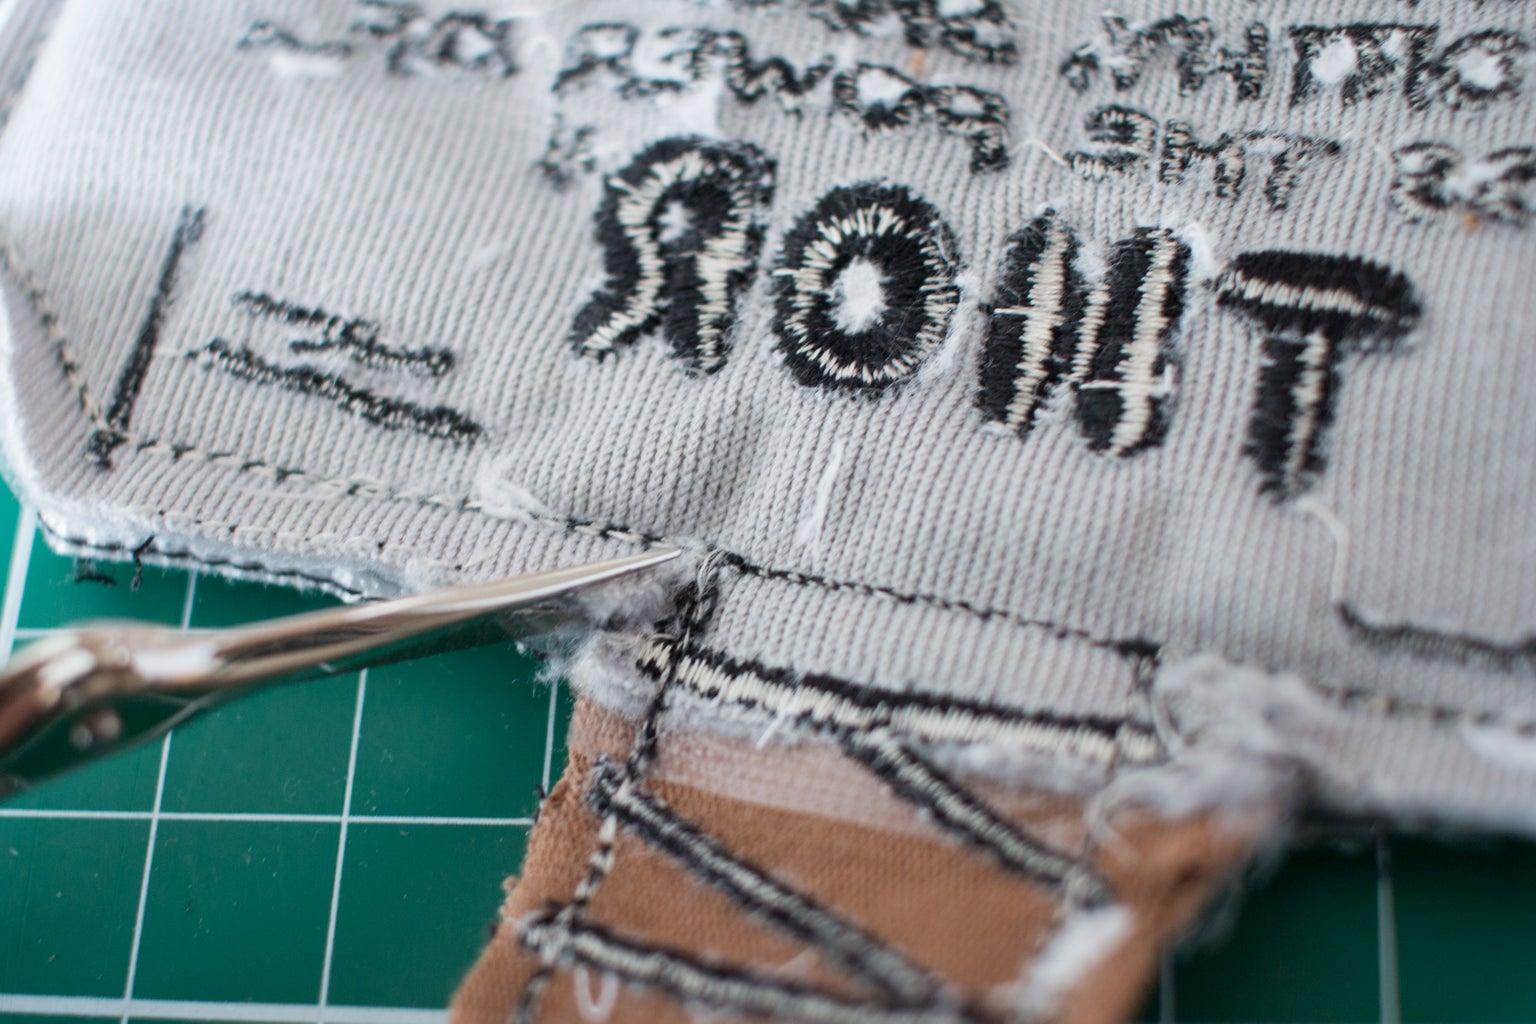 Turning the Fabric